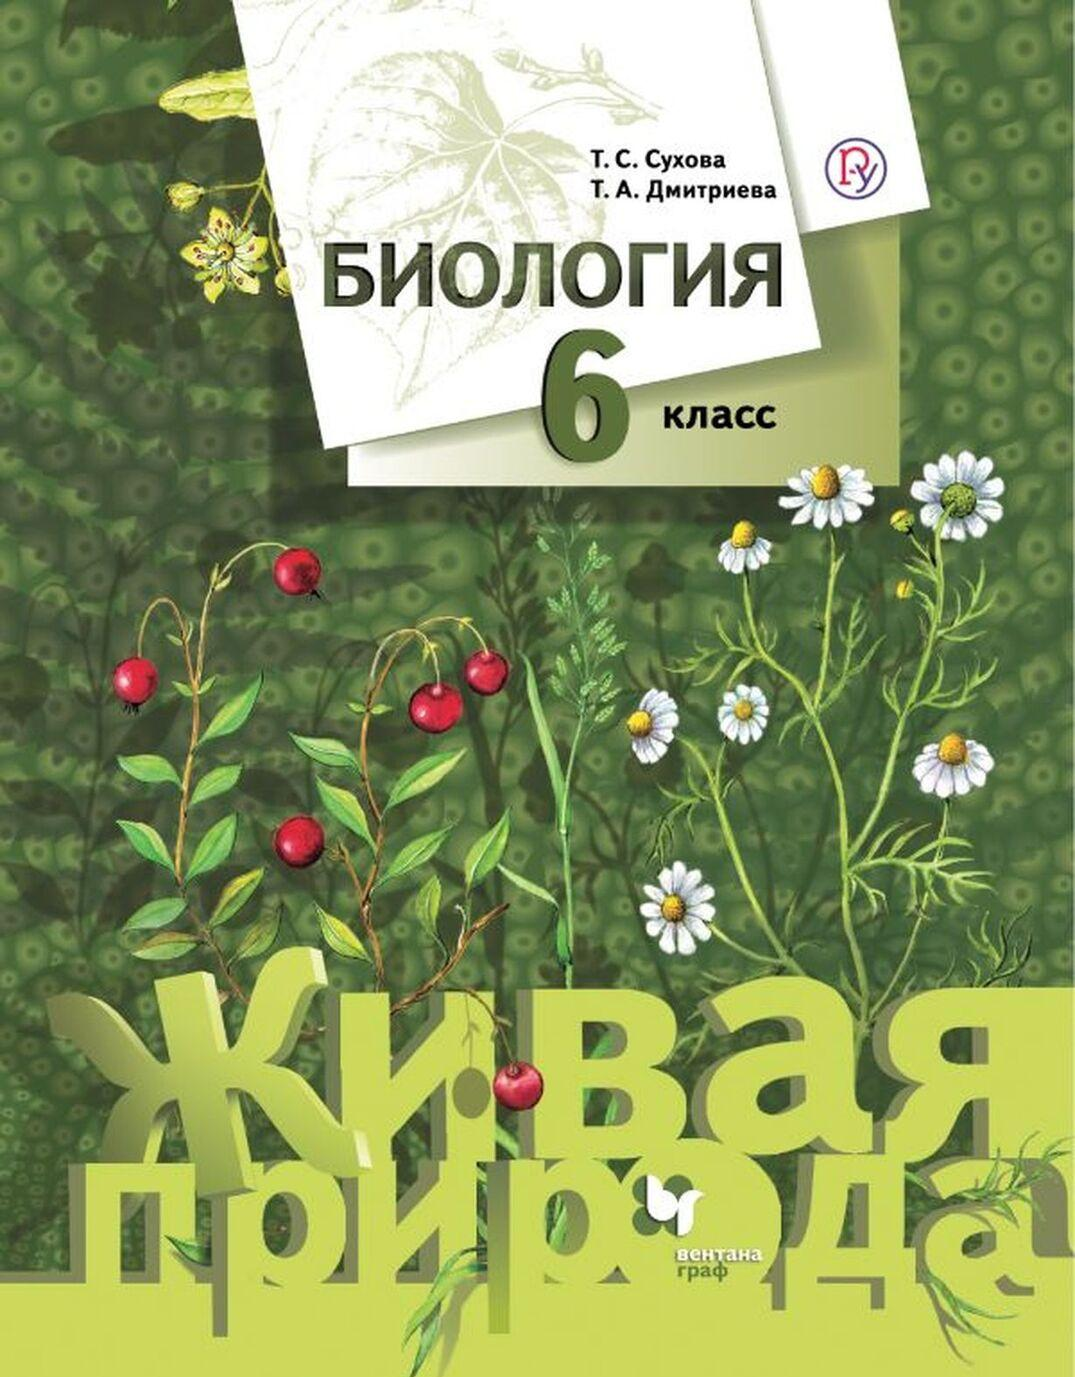 Biologija. 6klass. Uchebnik | Sukhova Tamara Sergeevna, Dmitrieva Tatjana Andreevna